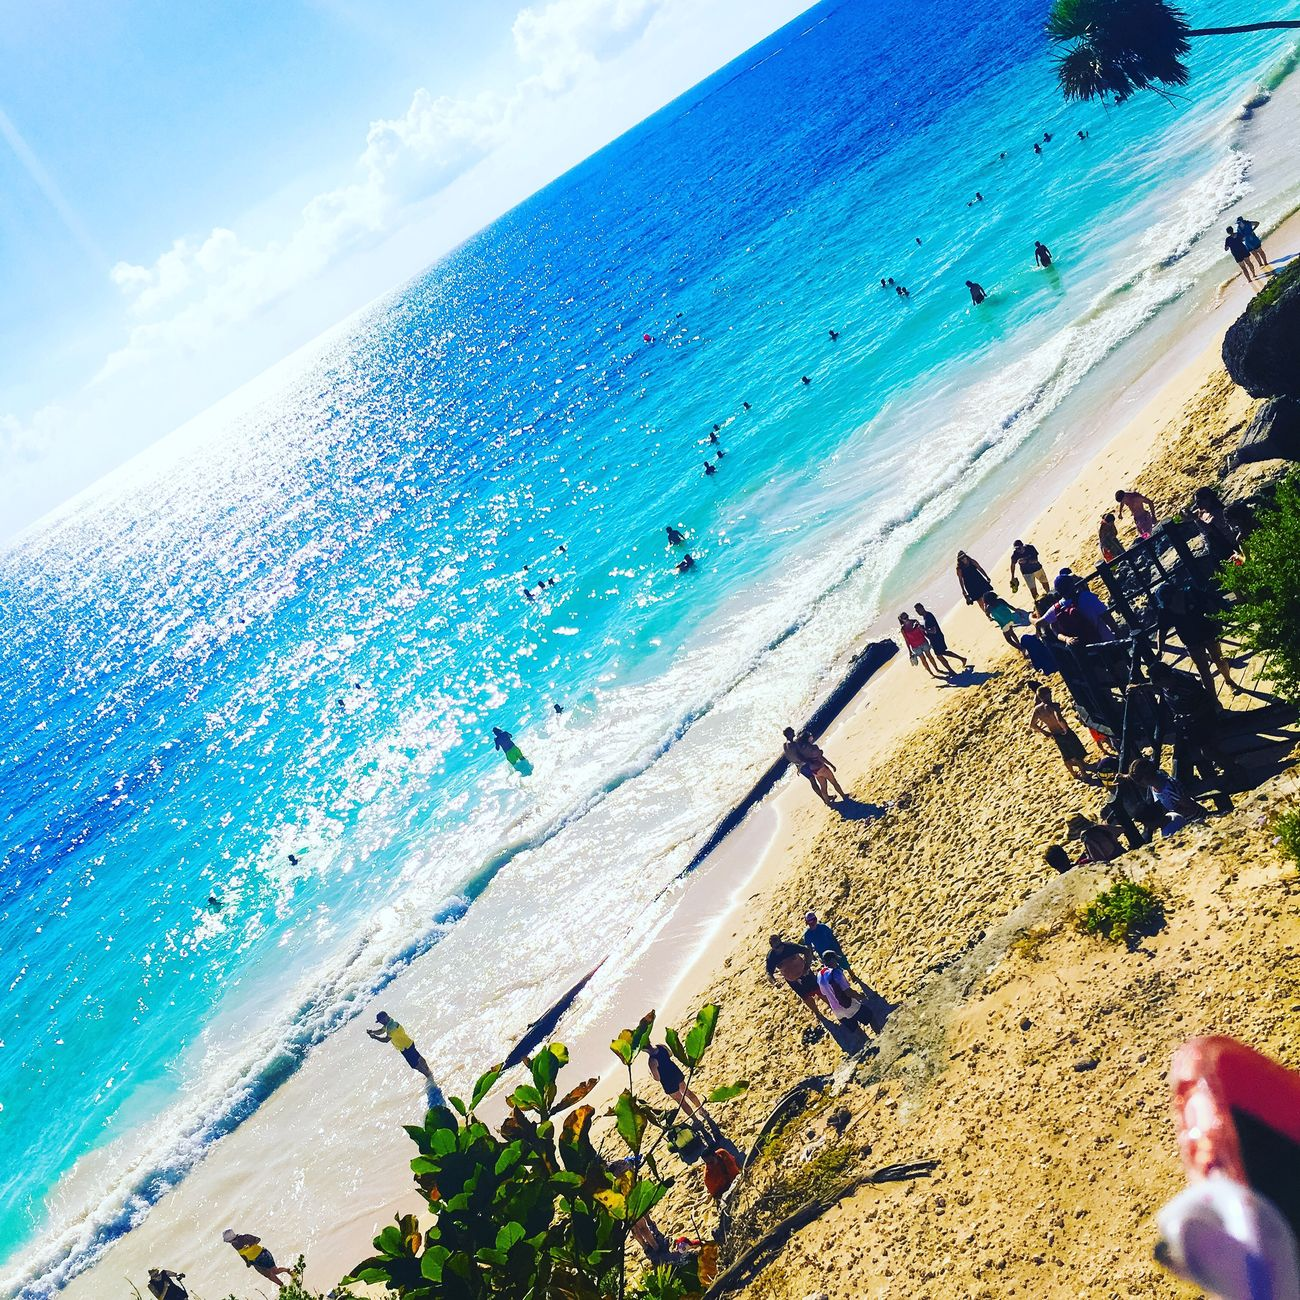 Playa de Tulúm 🏝🏊🏼🔥☀️🔥😎 / Tulum Beach 🏝 Beach Sea Tulum , Rivera Maya. Tulum Beach Tulum Ruins Mexico Water Sand